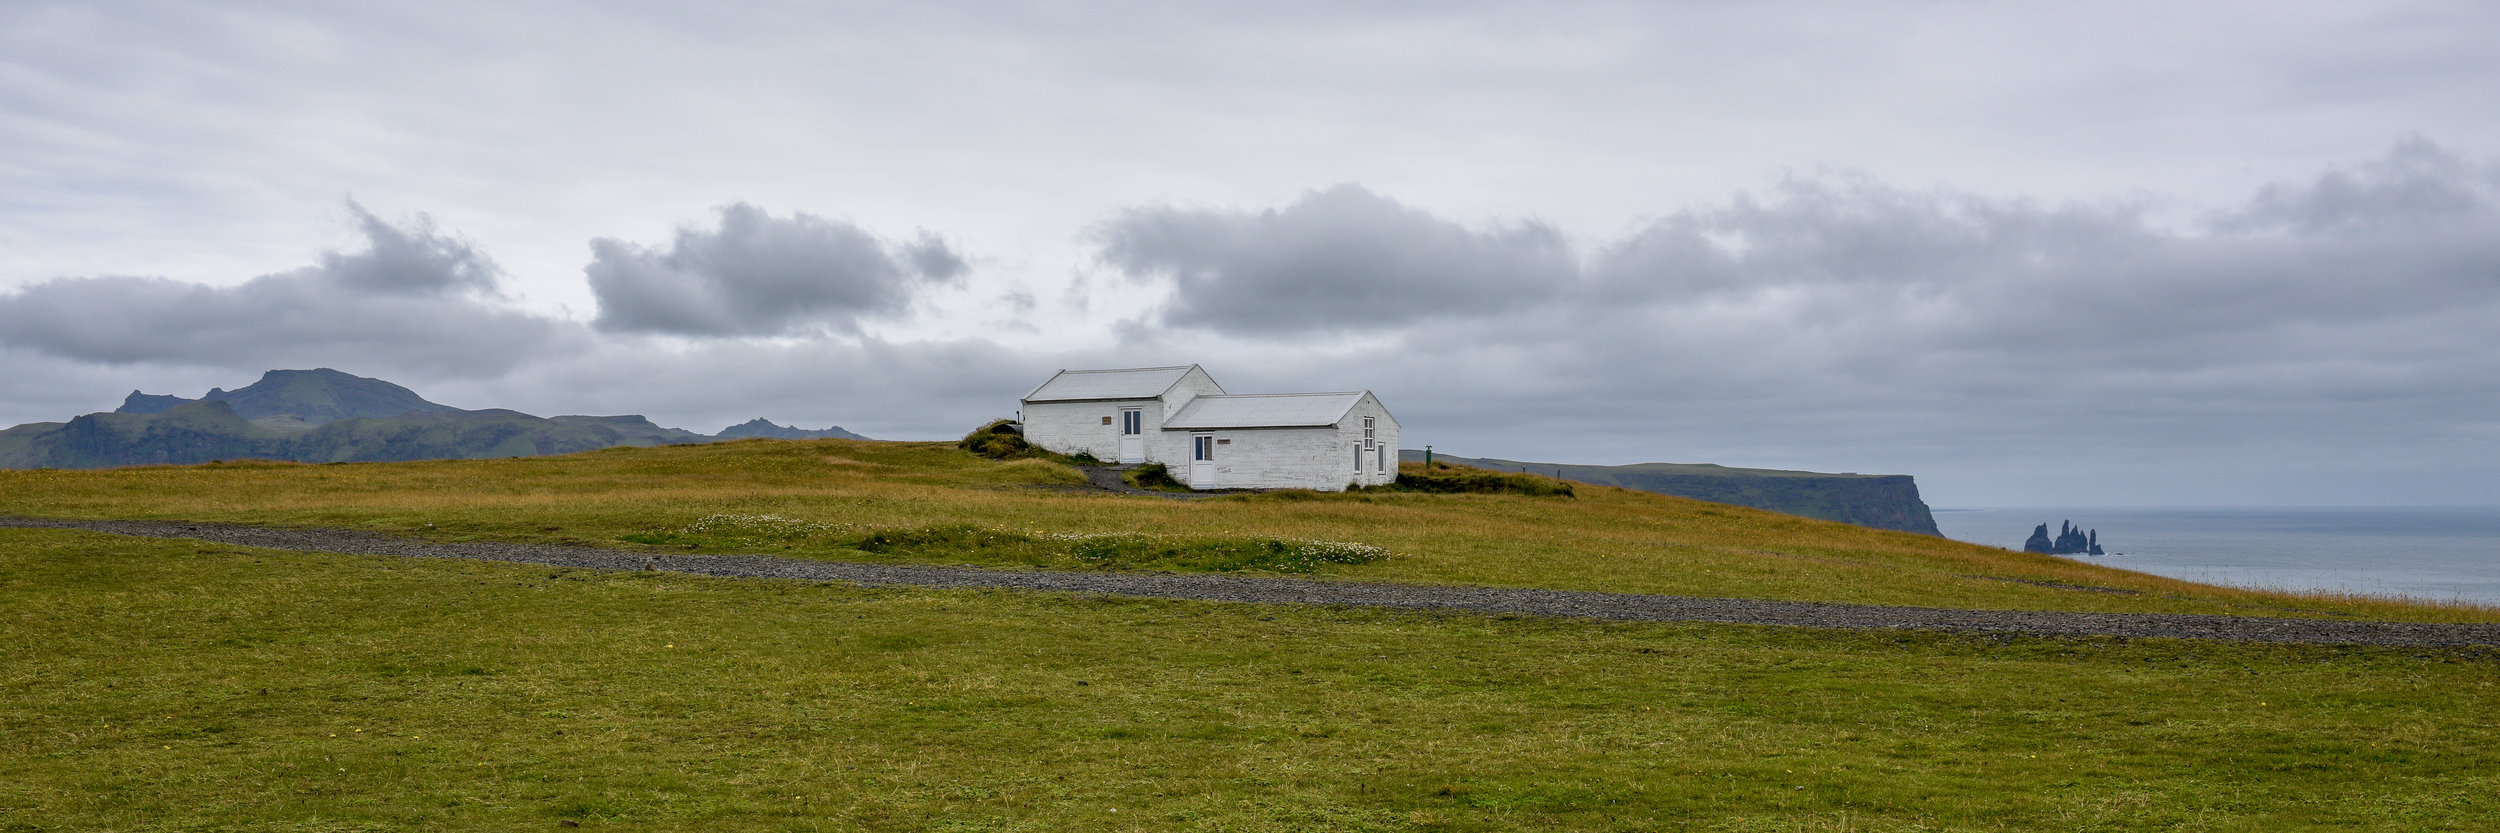 Iceland (2016)